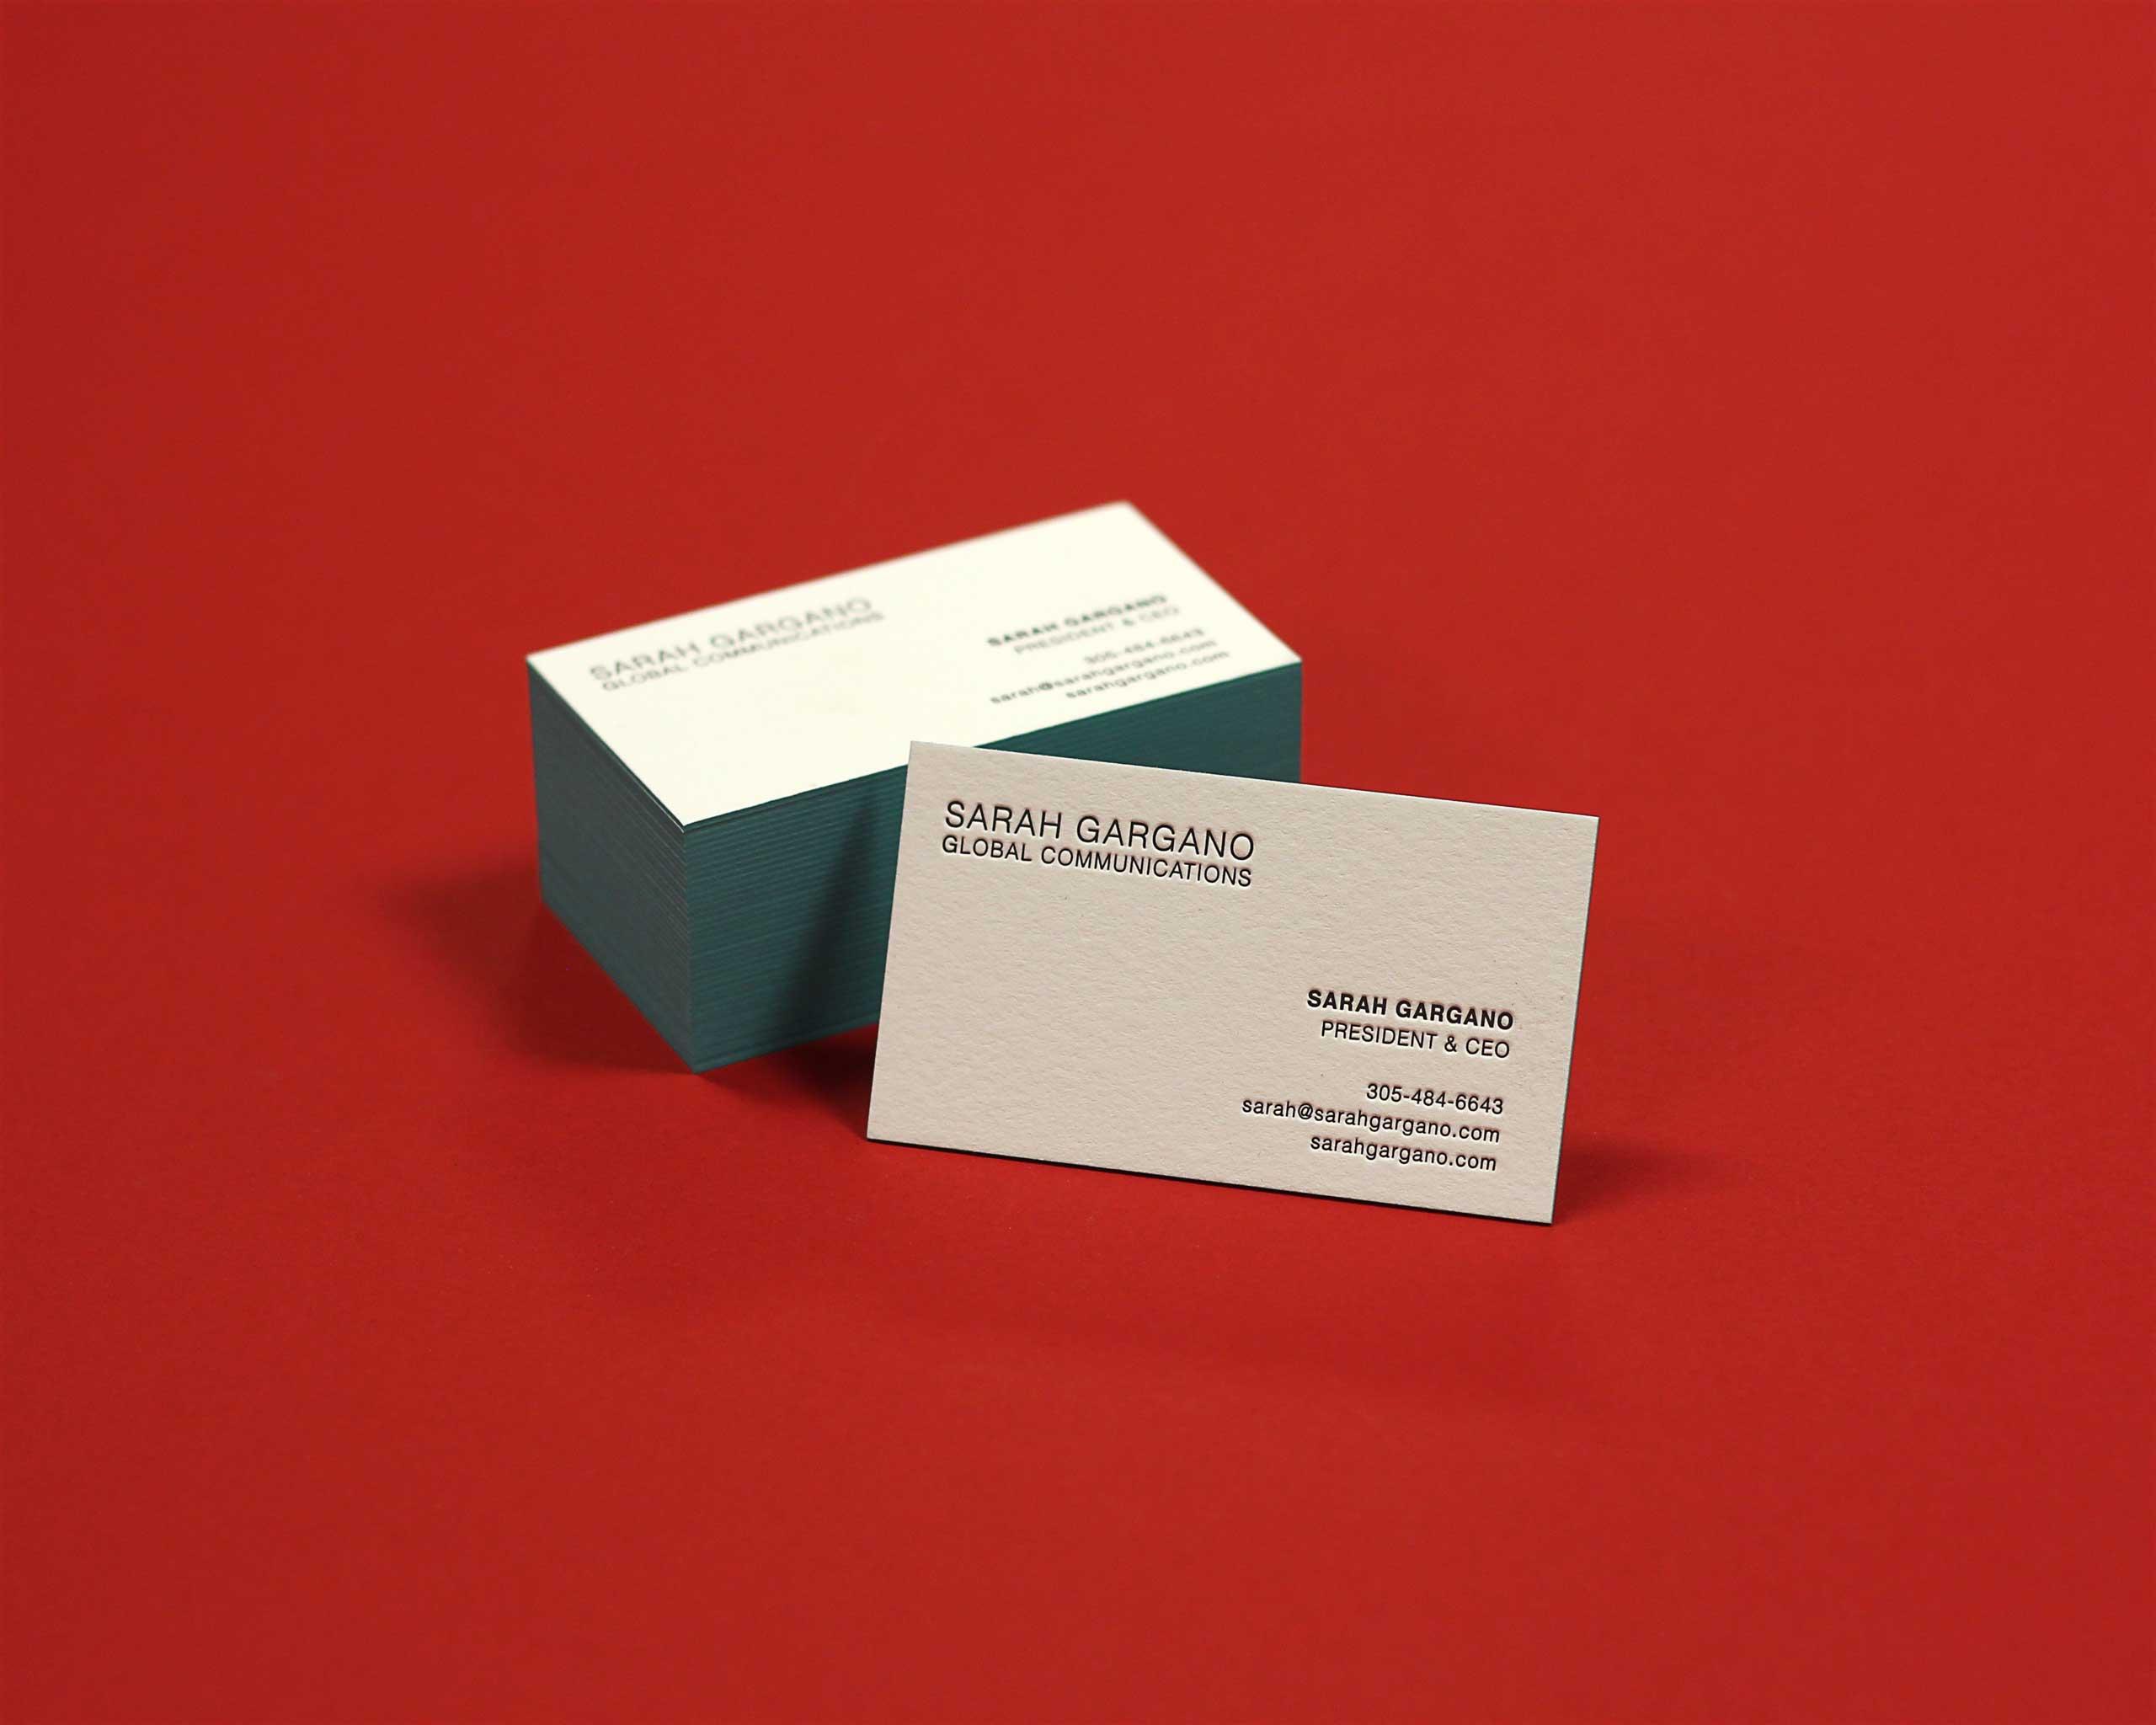 Sarah Gargano letterpress business cards